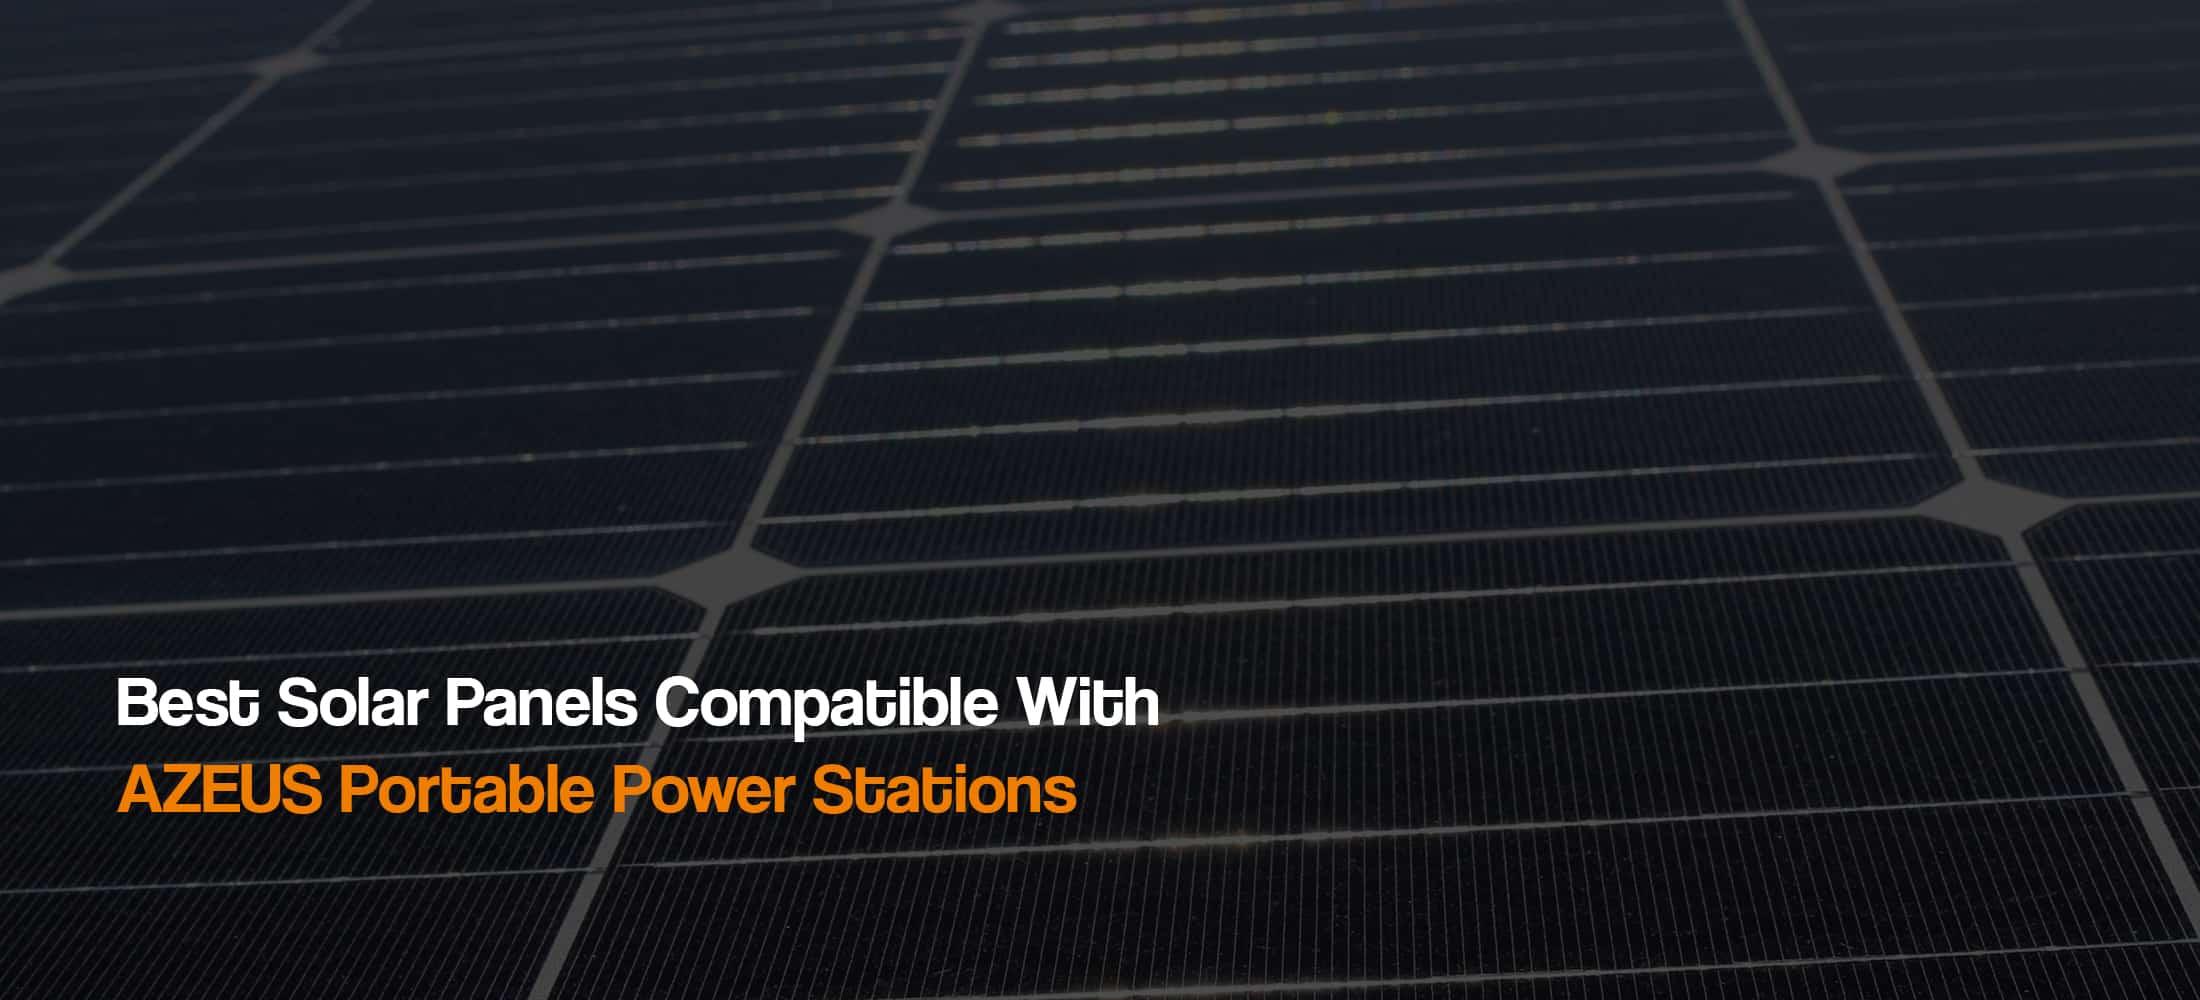 best-solar-panels-compatible-with-azeus-solar-generators-power-stations-the-solar-addict